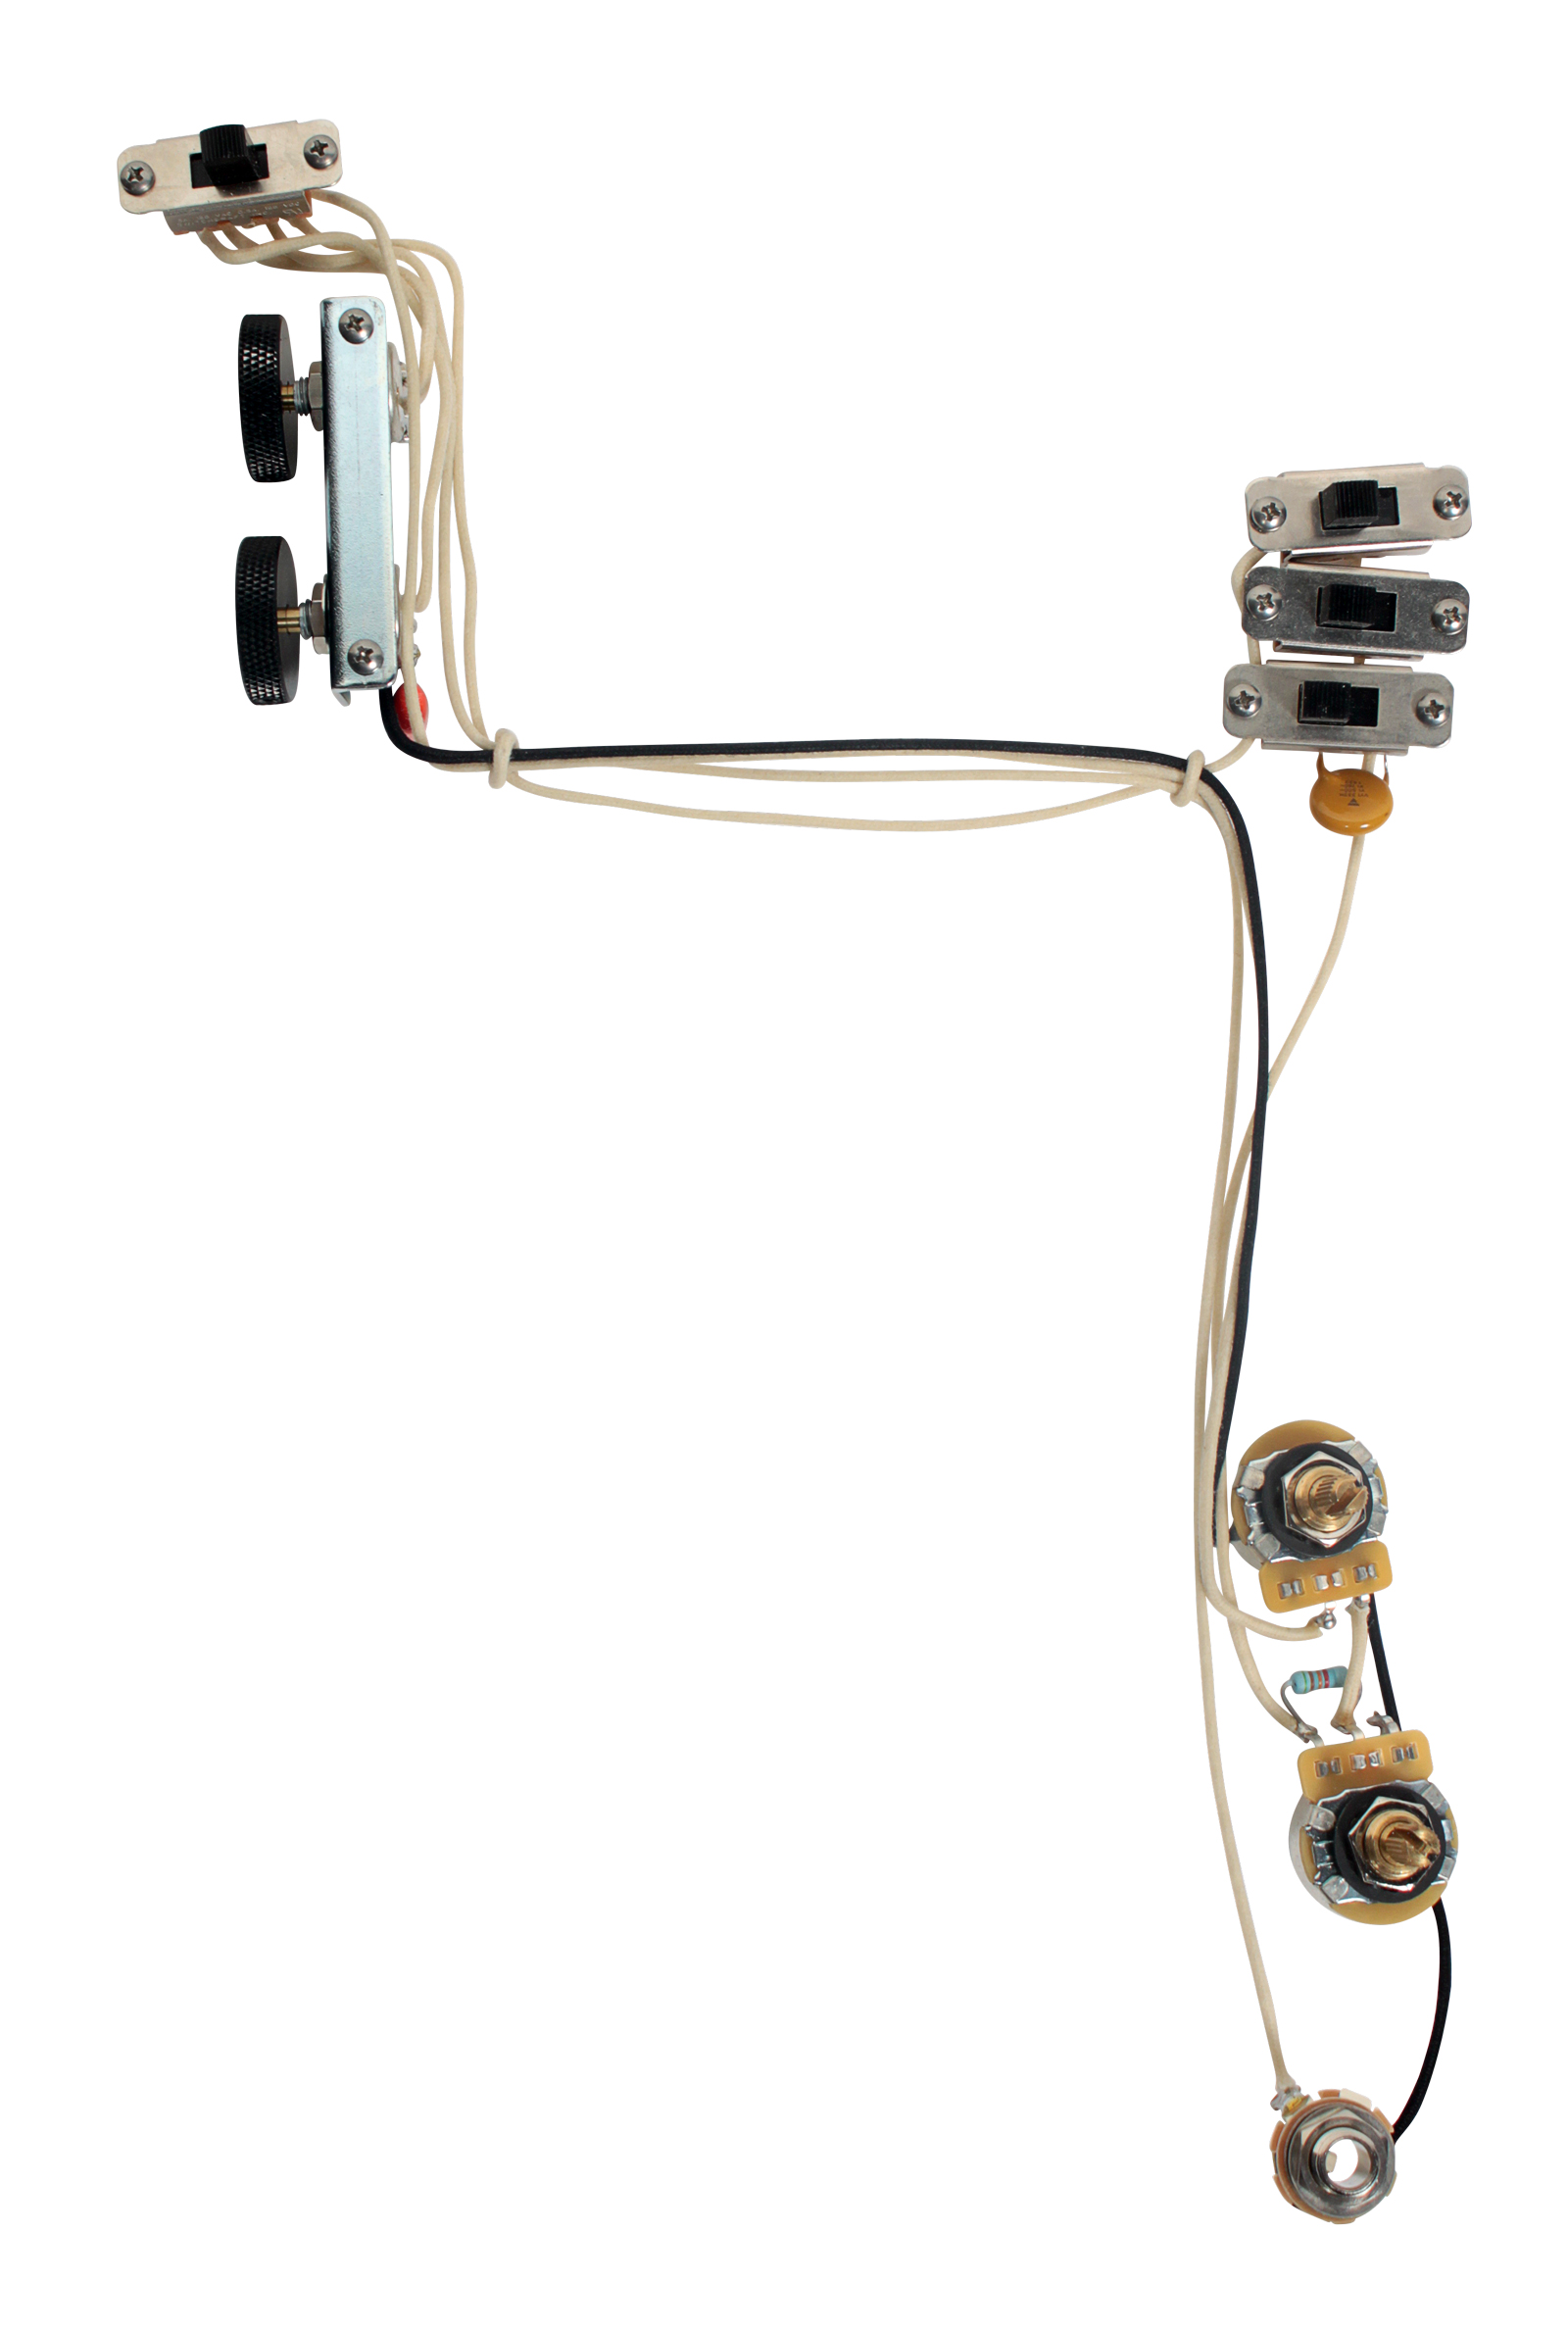 universal wiring harness kits for old cars wiring kits for jaguar toneshapers fender vintage '62 jaguar prewired harness pots switch ...